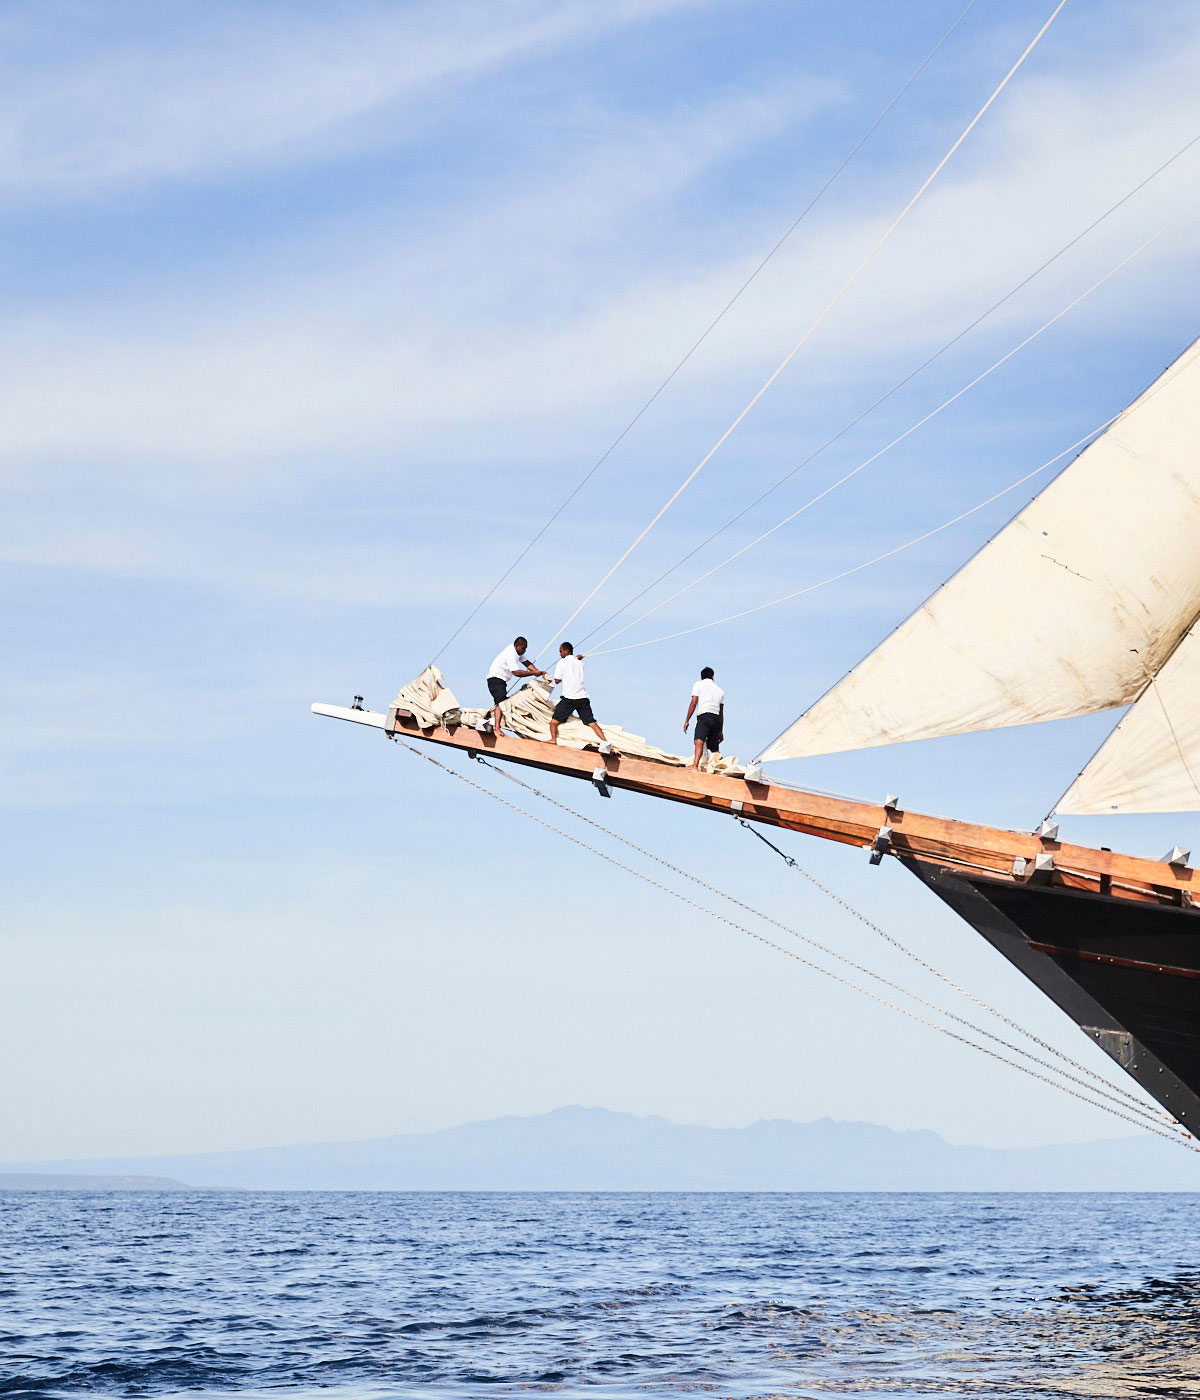 Amandira crew taking down the sails